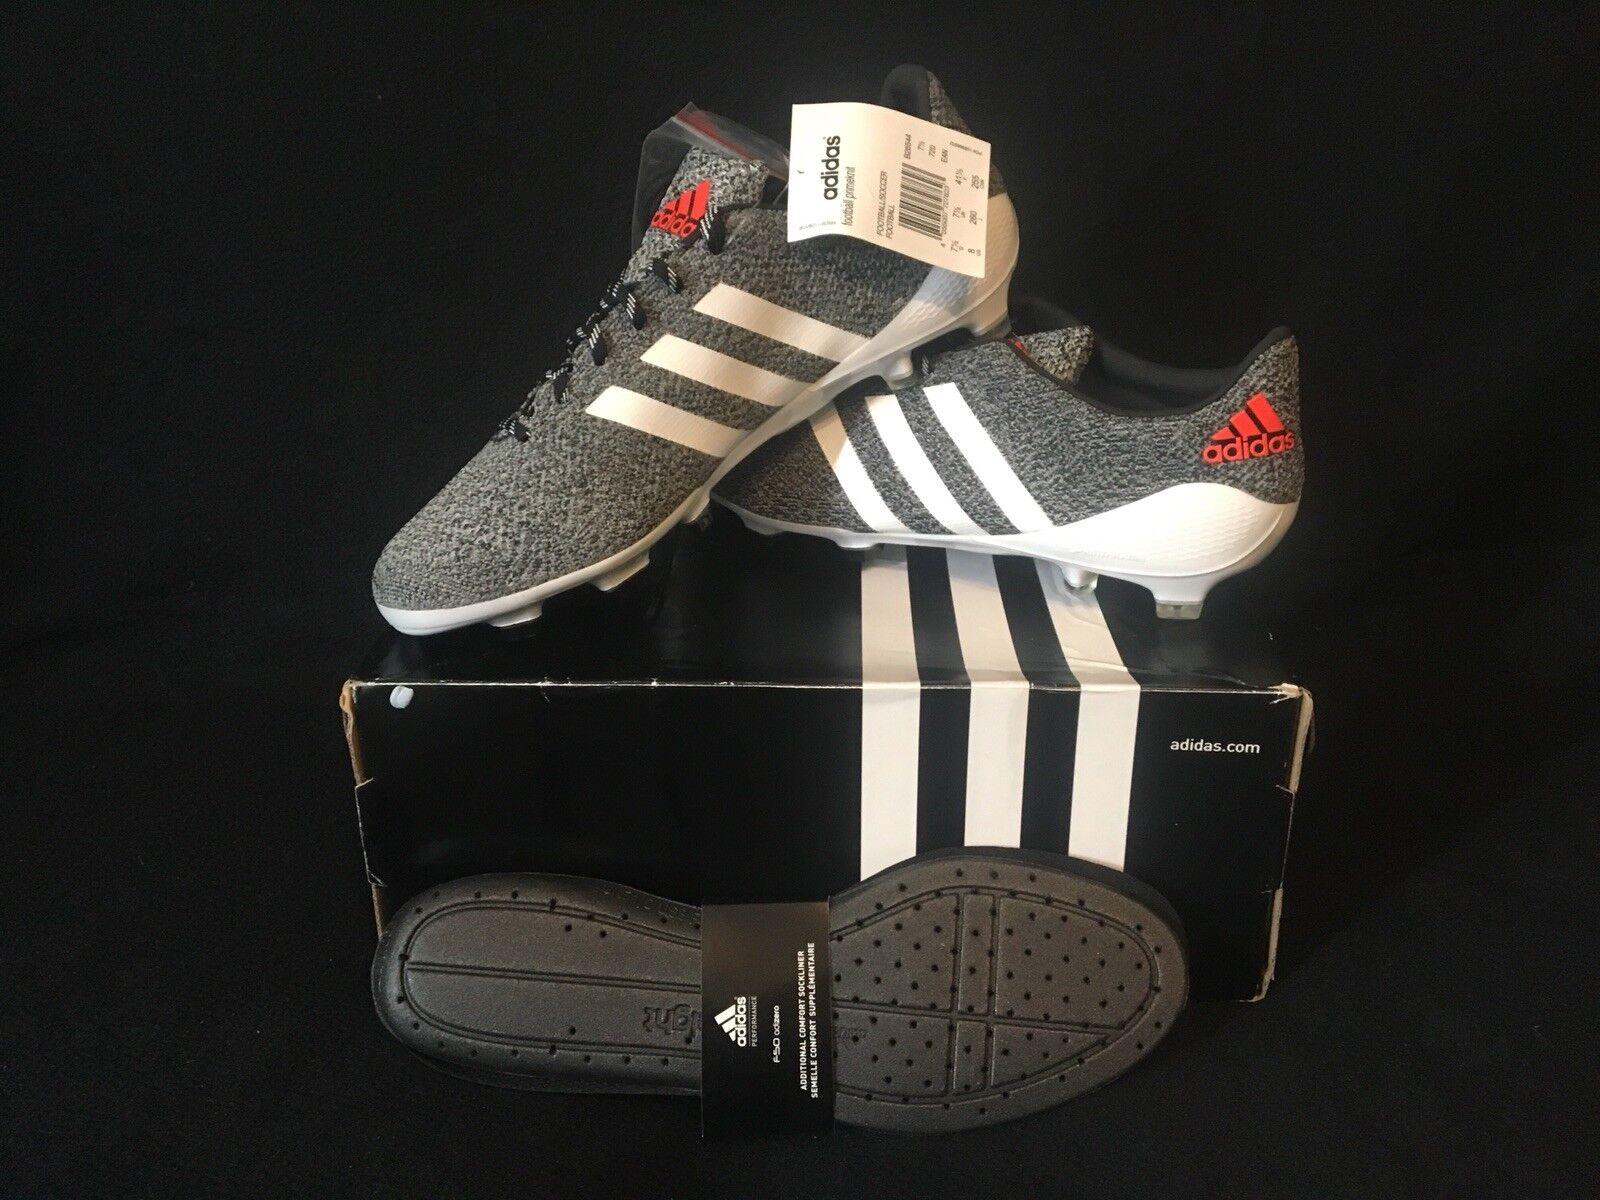 Adidas Battle Pack Primeknit botas de fútbol edición limitada solo 500 Pares